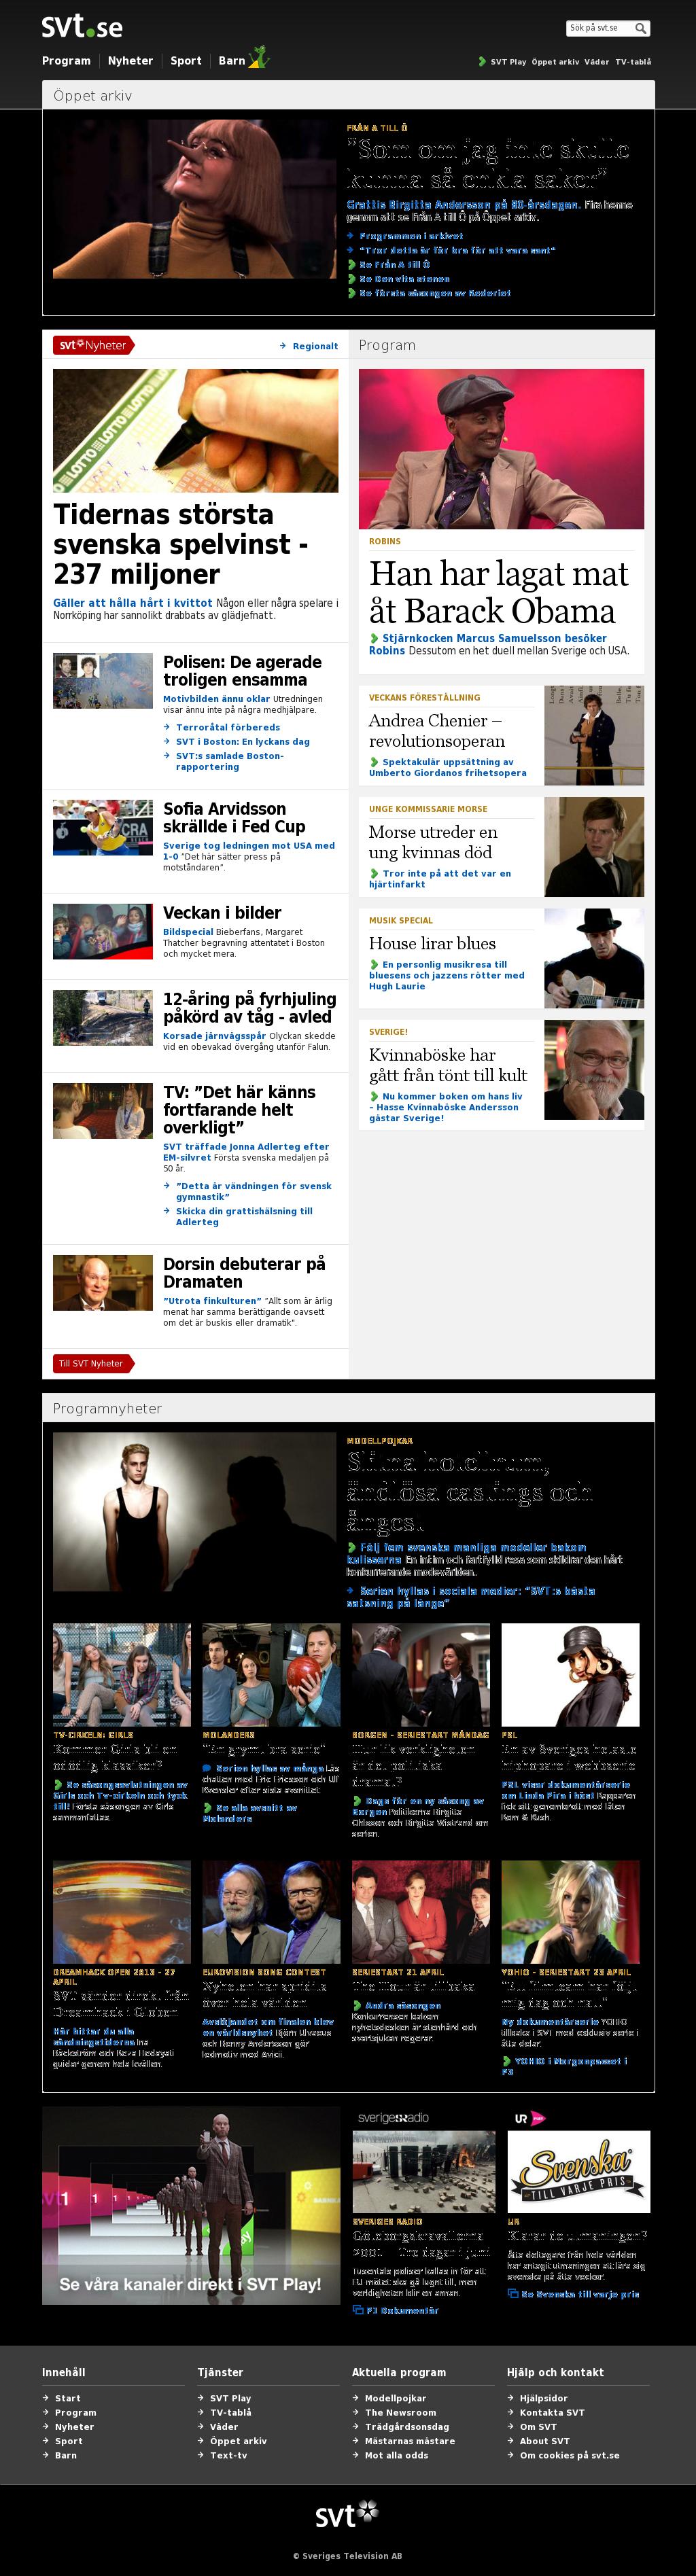 SVT at Saturday April 20, 2013, 9:21 p.m. UTC